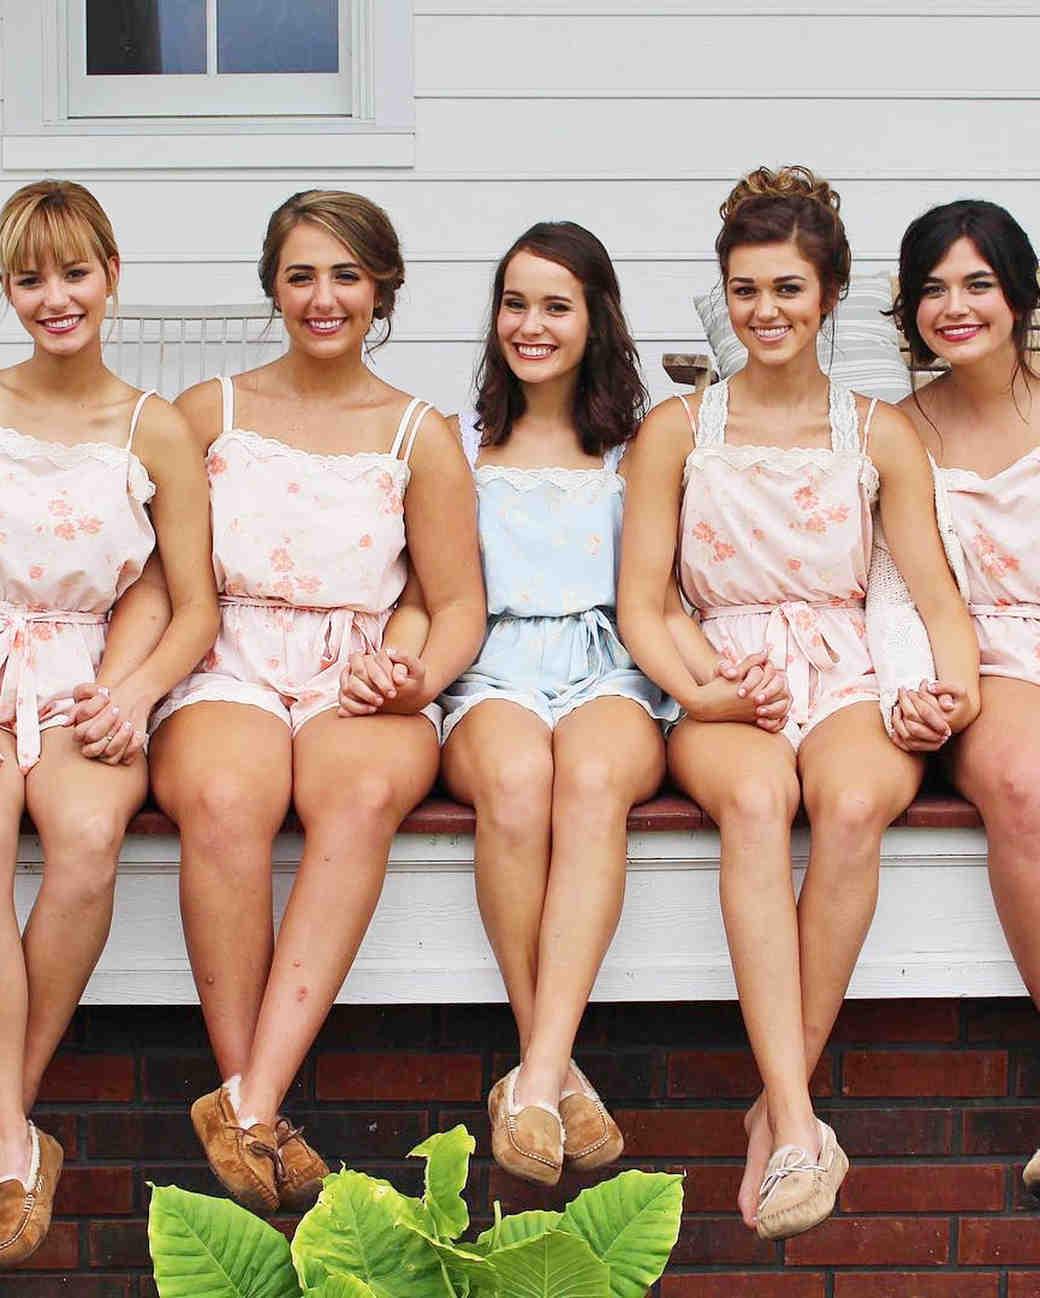 bridesmaids u0026 39  robes alternatives to set you and your  u0026 39 maids apart